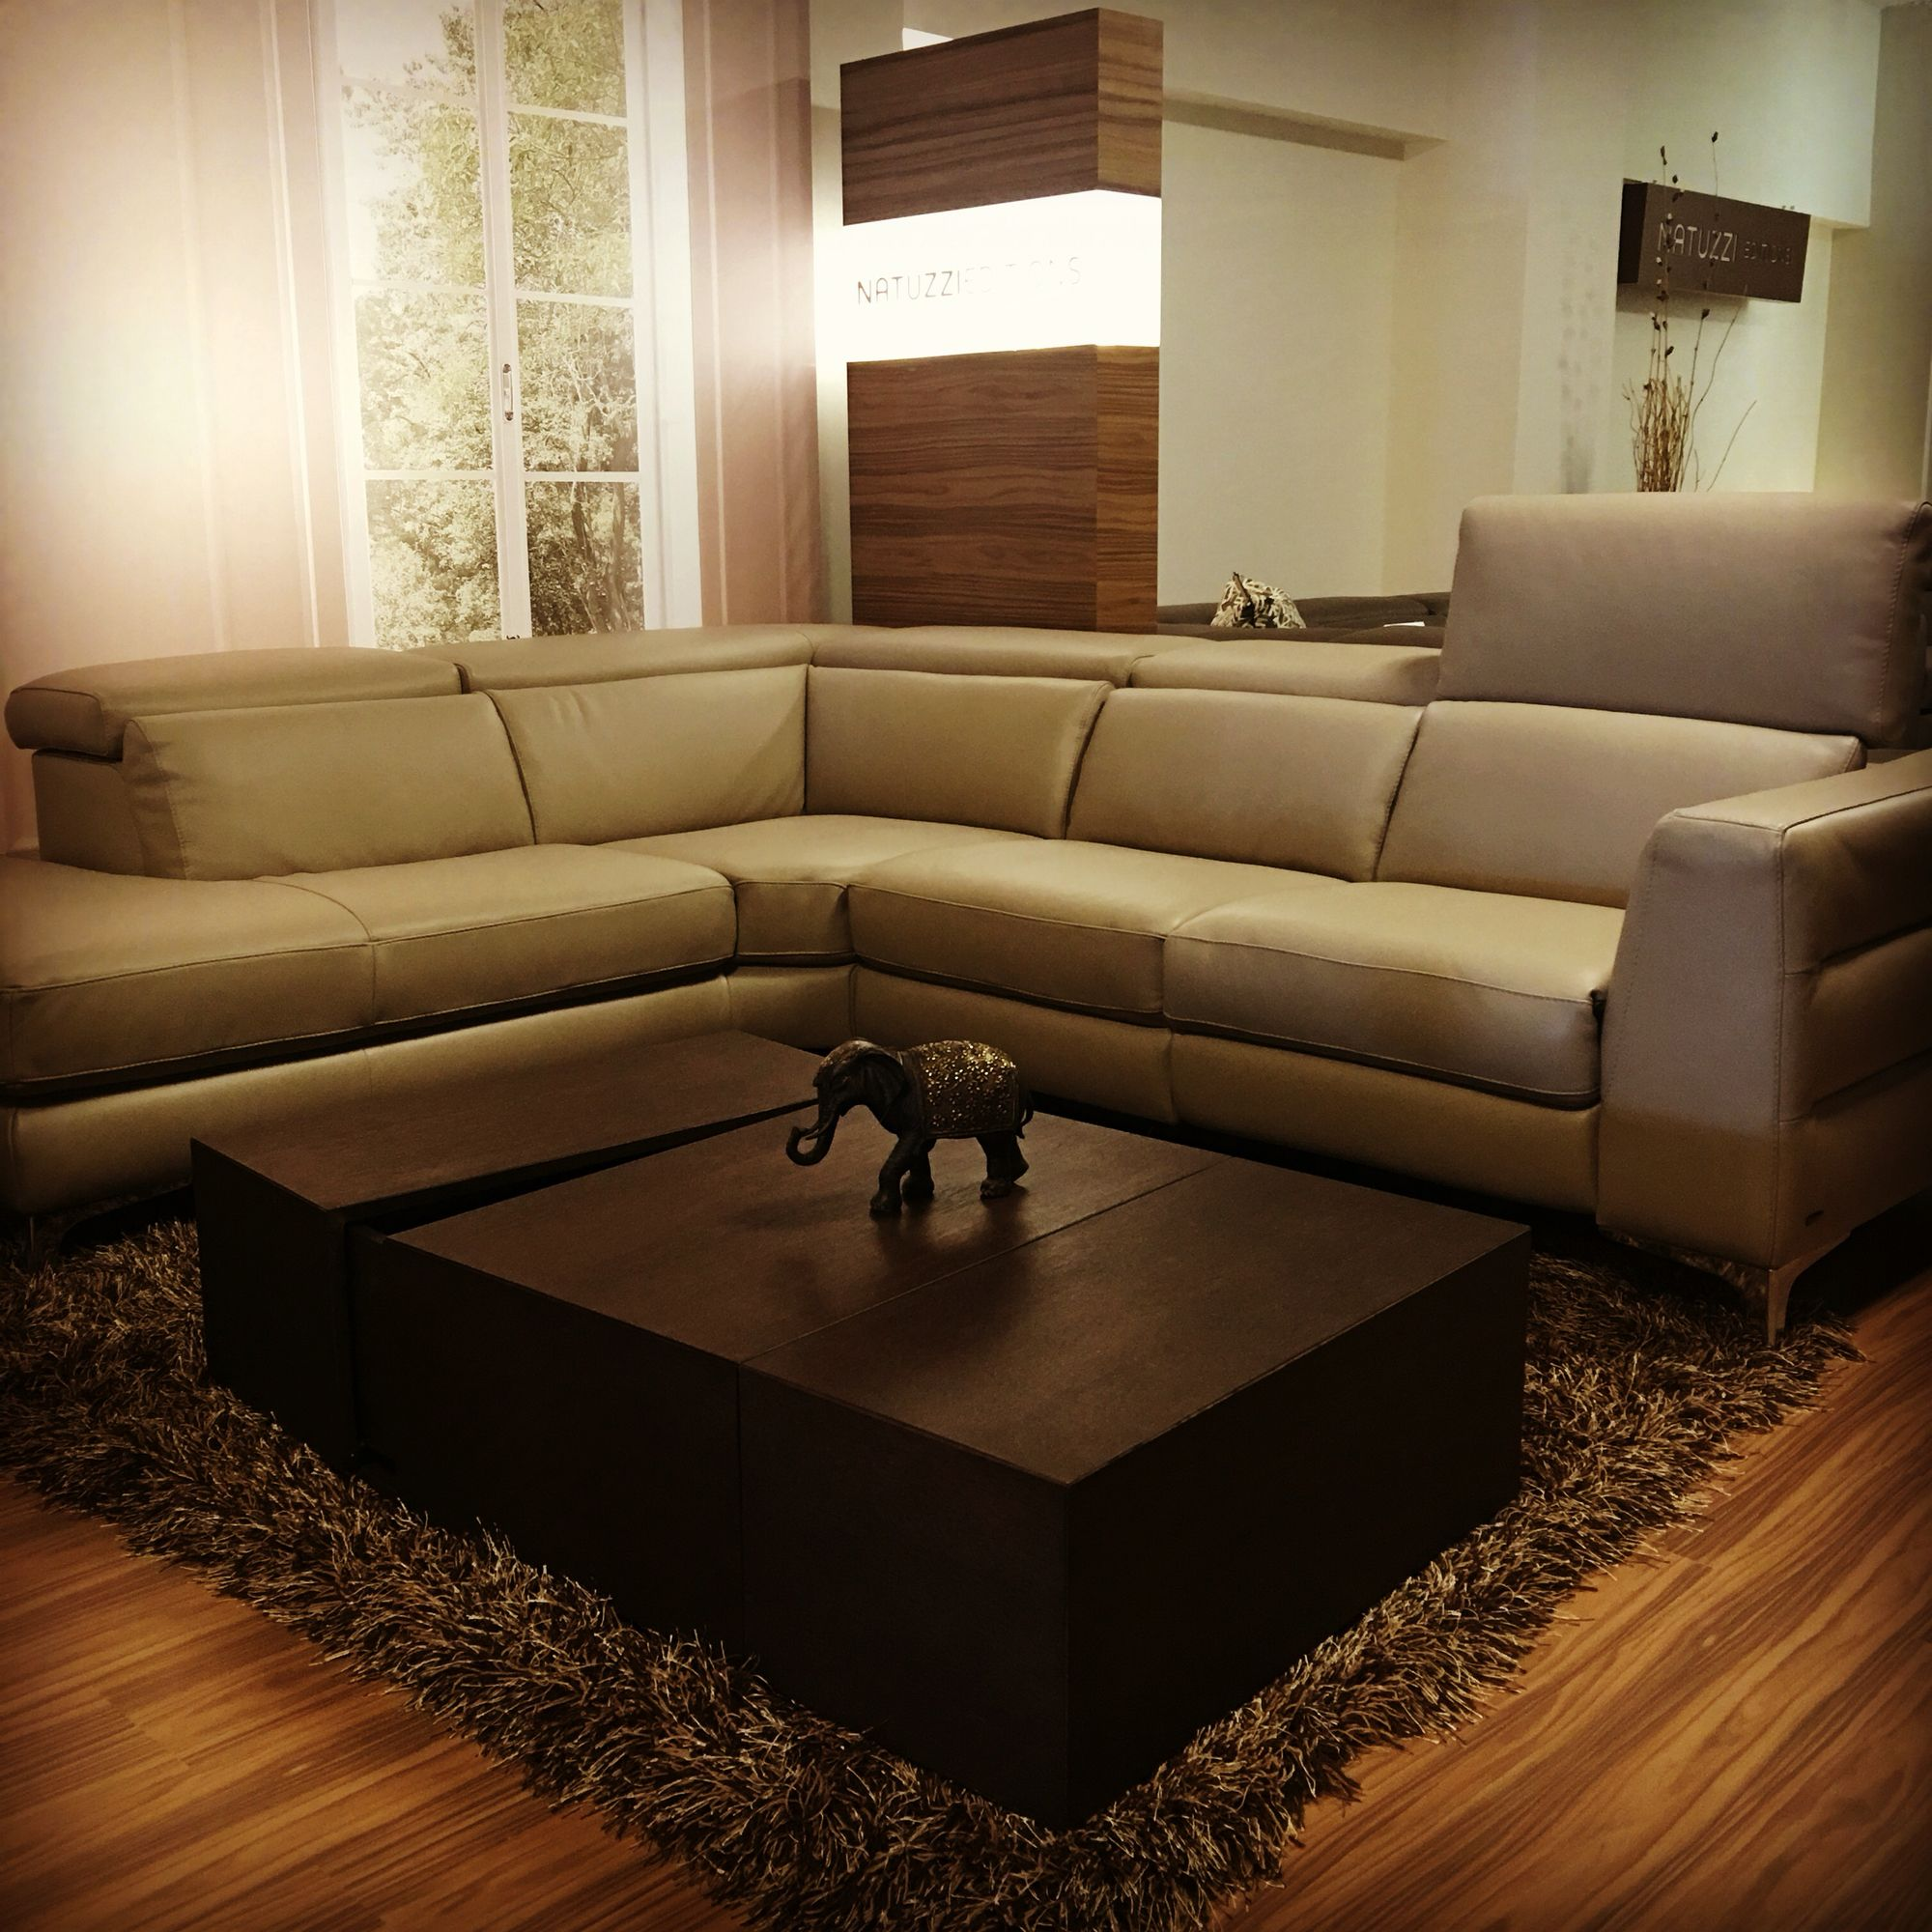 Natuzzi Corner Sofas Uk